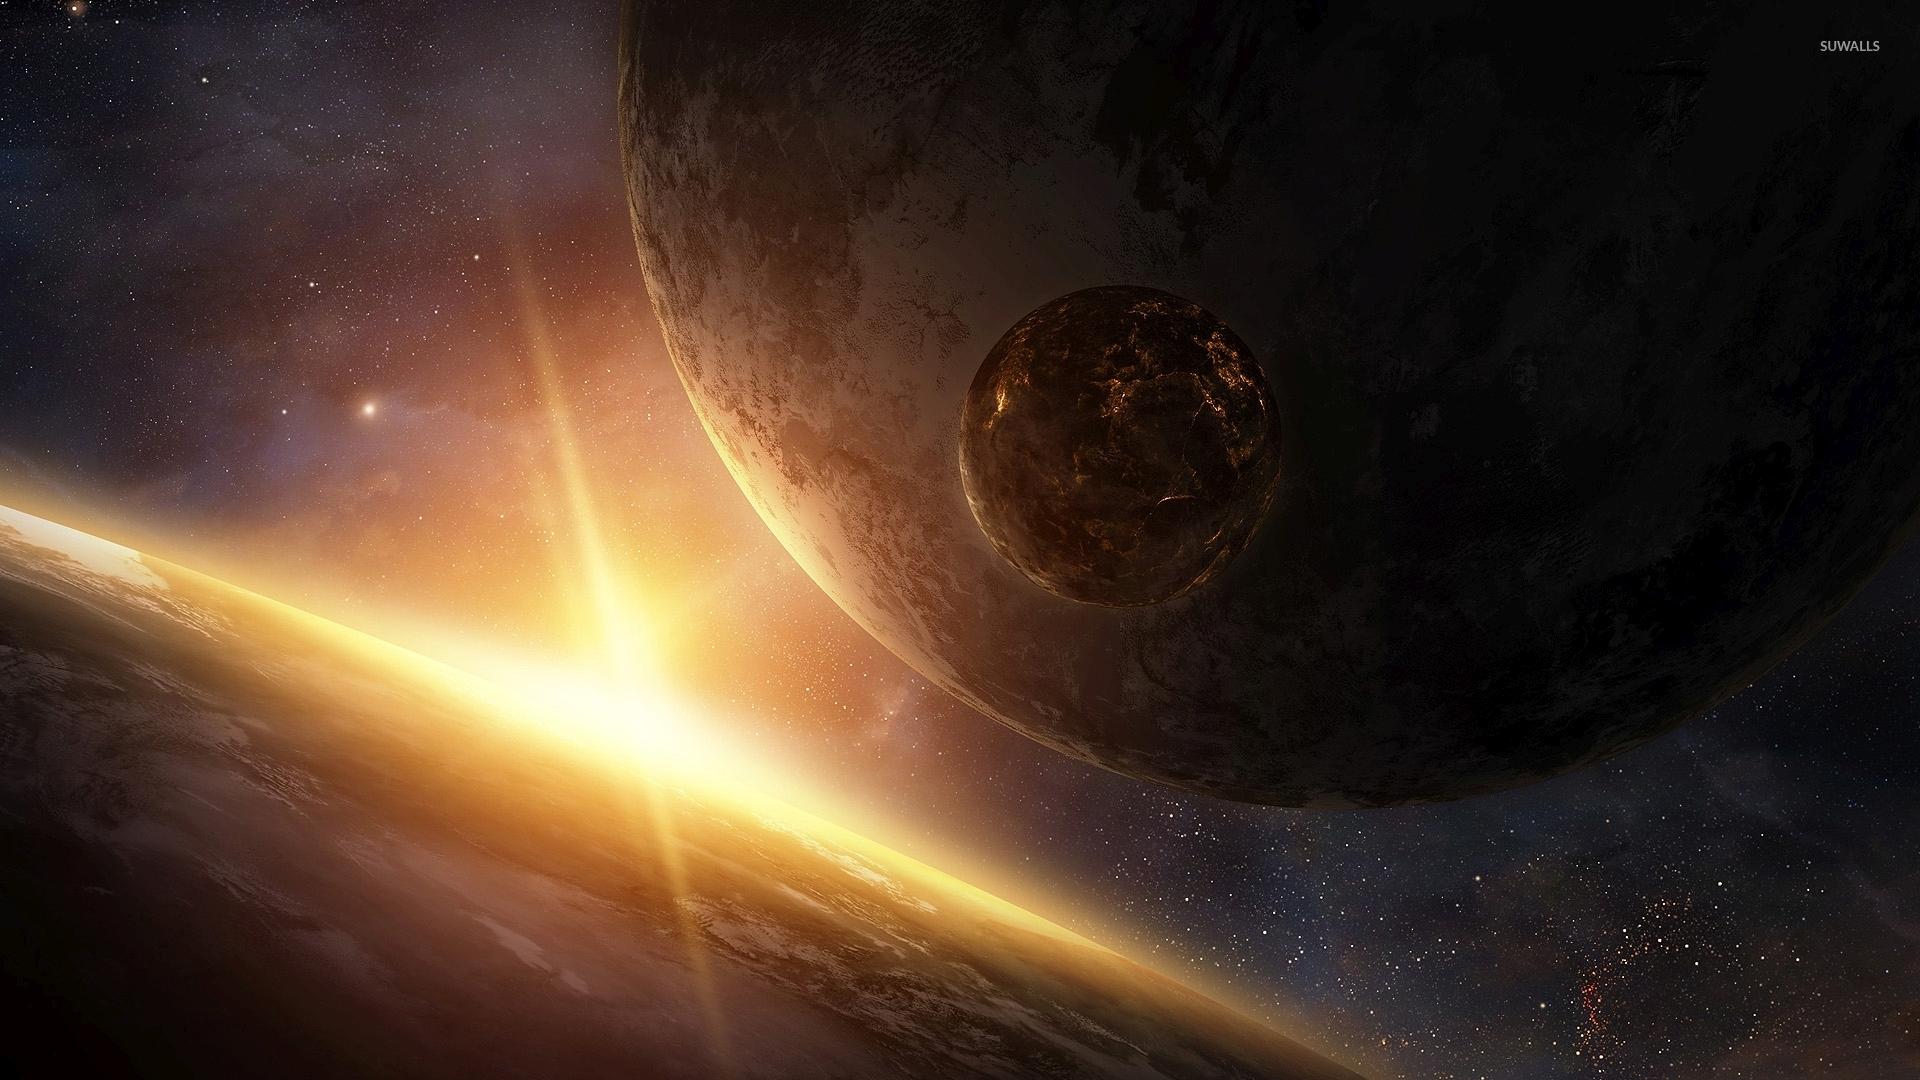 fire planet space wallpaper - photo #11